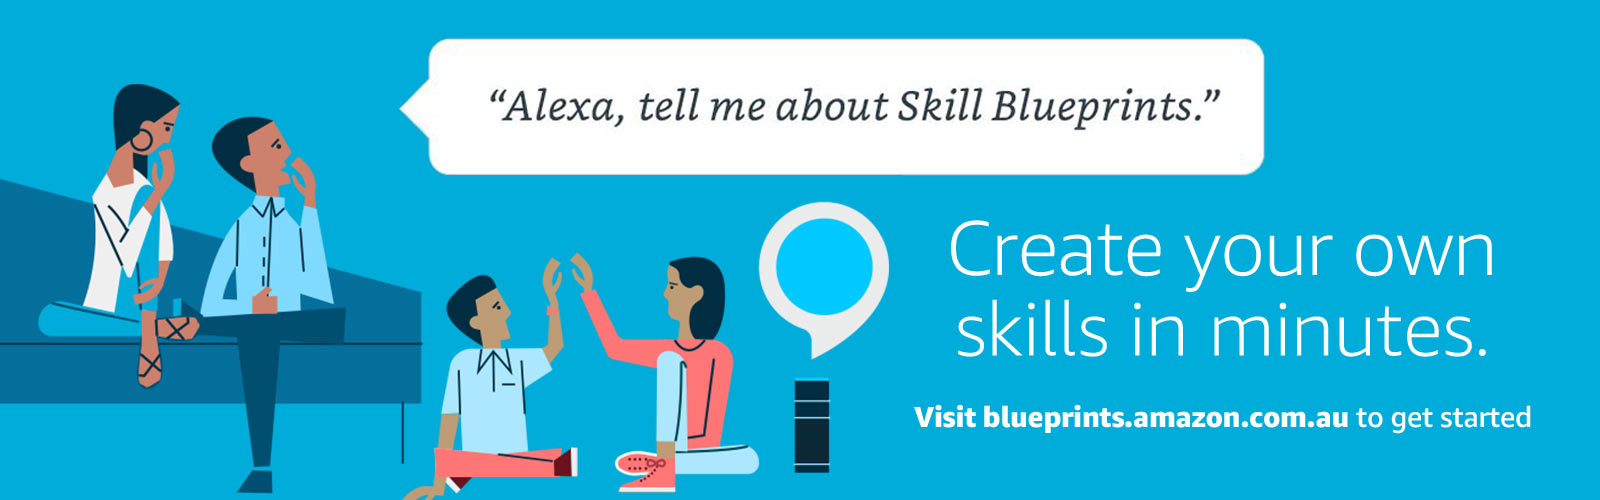 """Alexa, what are blueprint skills?"""